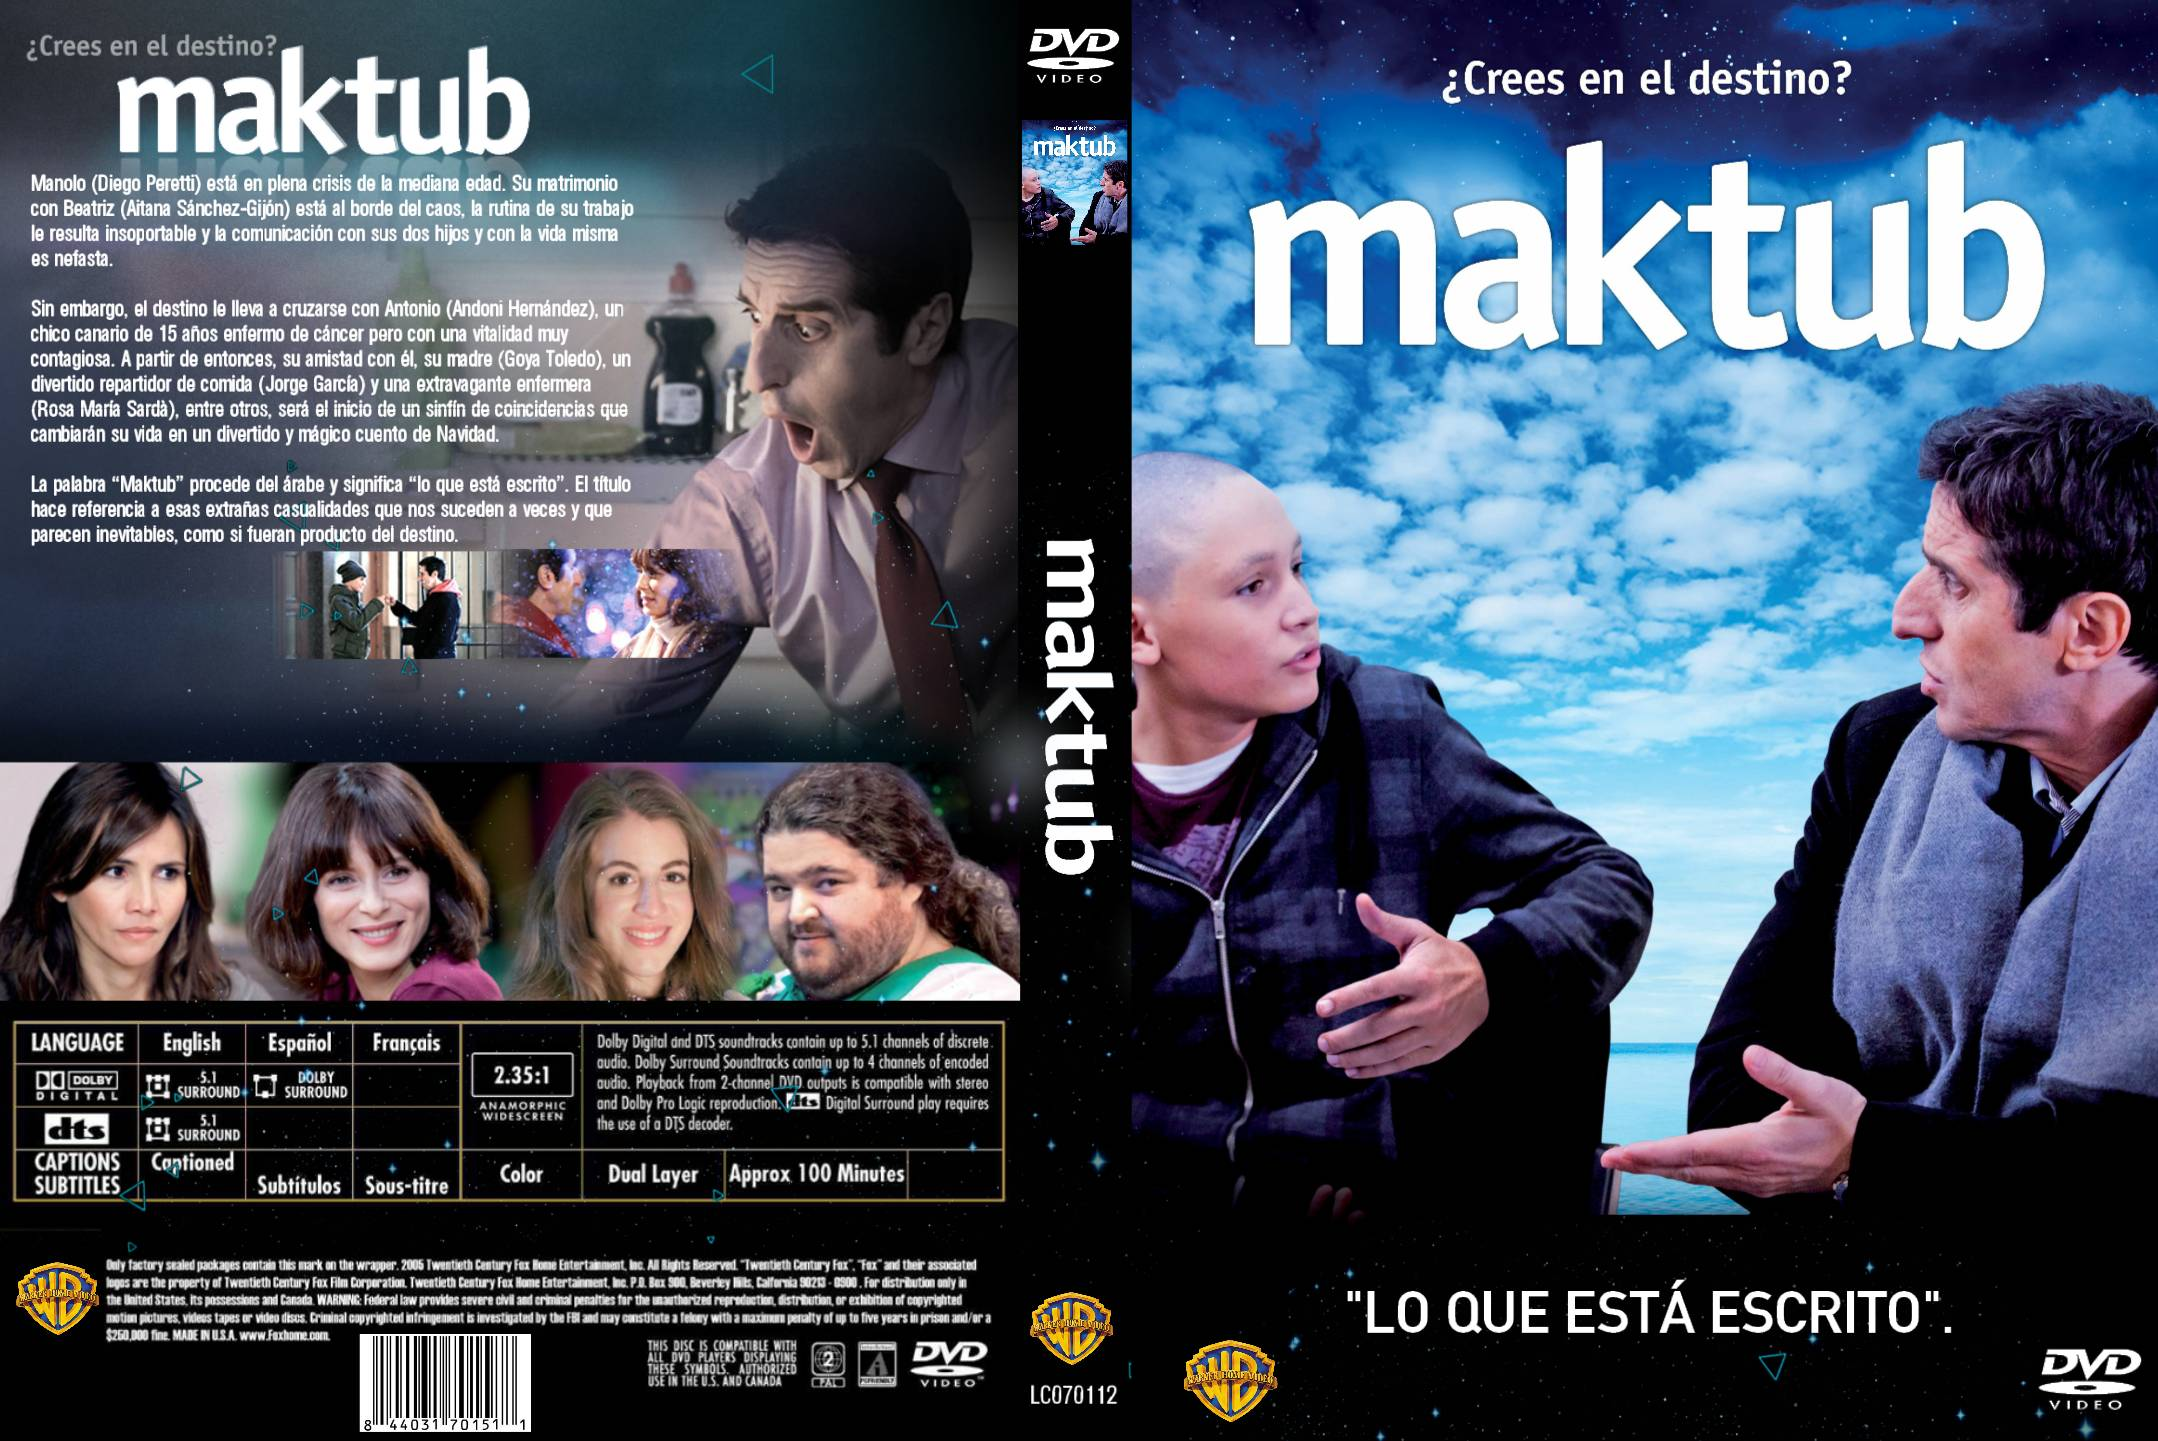 Maktub | Watch free movies. Download full movies. Mp4